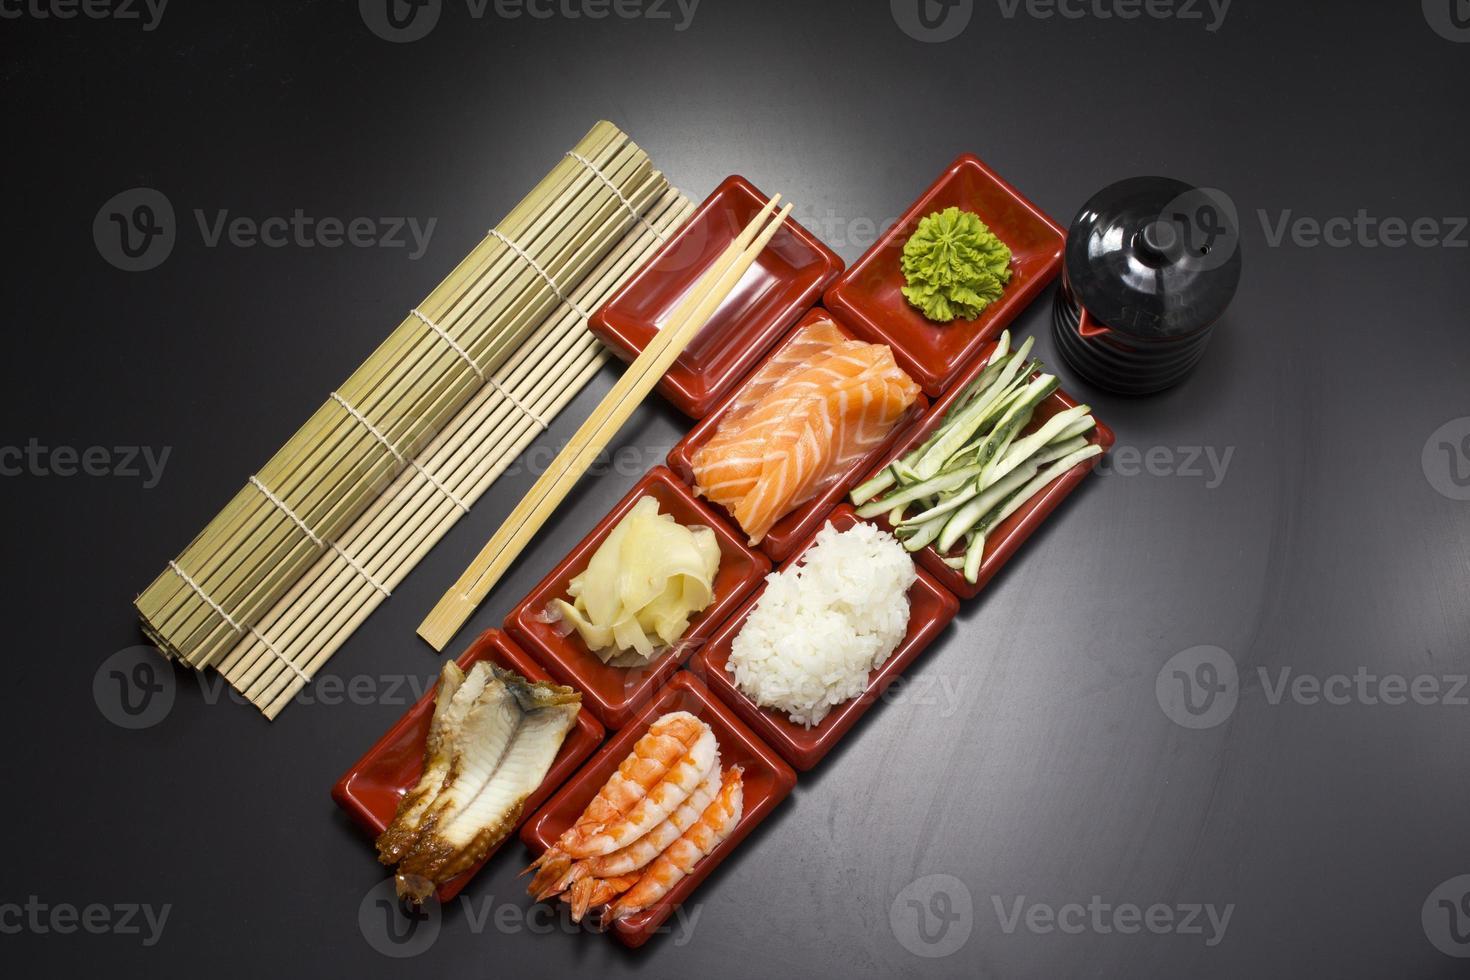 ingrediënten voor sushi: gesneden zalm, komkommer, rijst, wasabi en gember foto